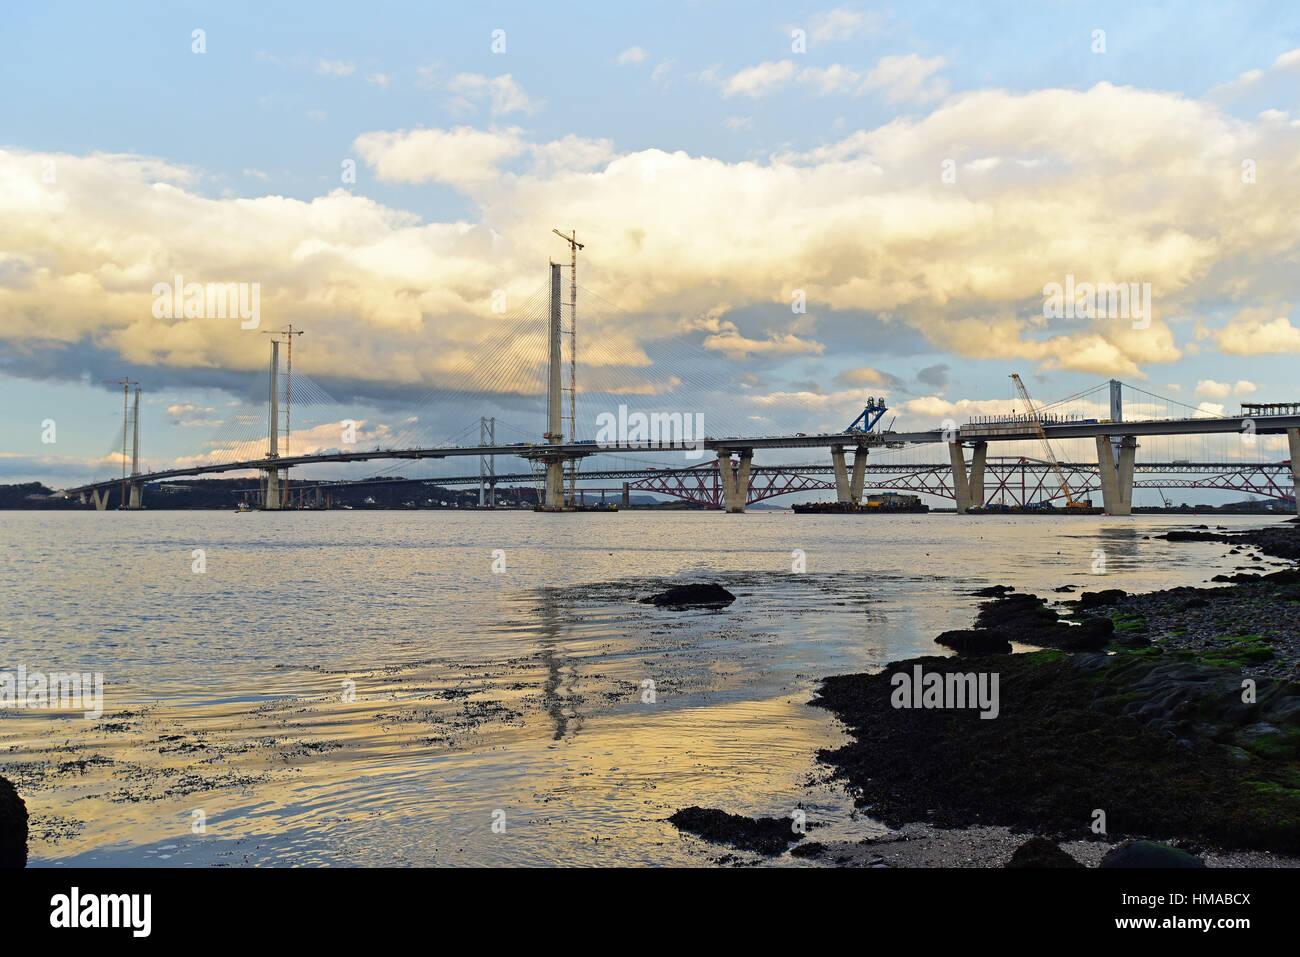 Edinburgh, Scotland, UK. 2nd Feb, 2017. The new Queensferry Crossing road bridge across the Forth Estuary appears - Stock Image